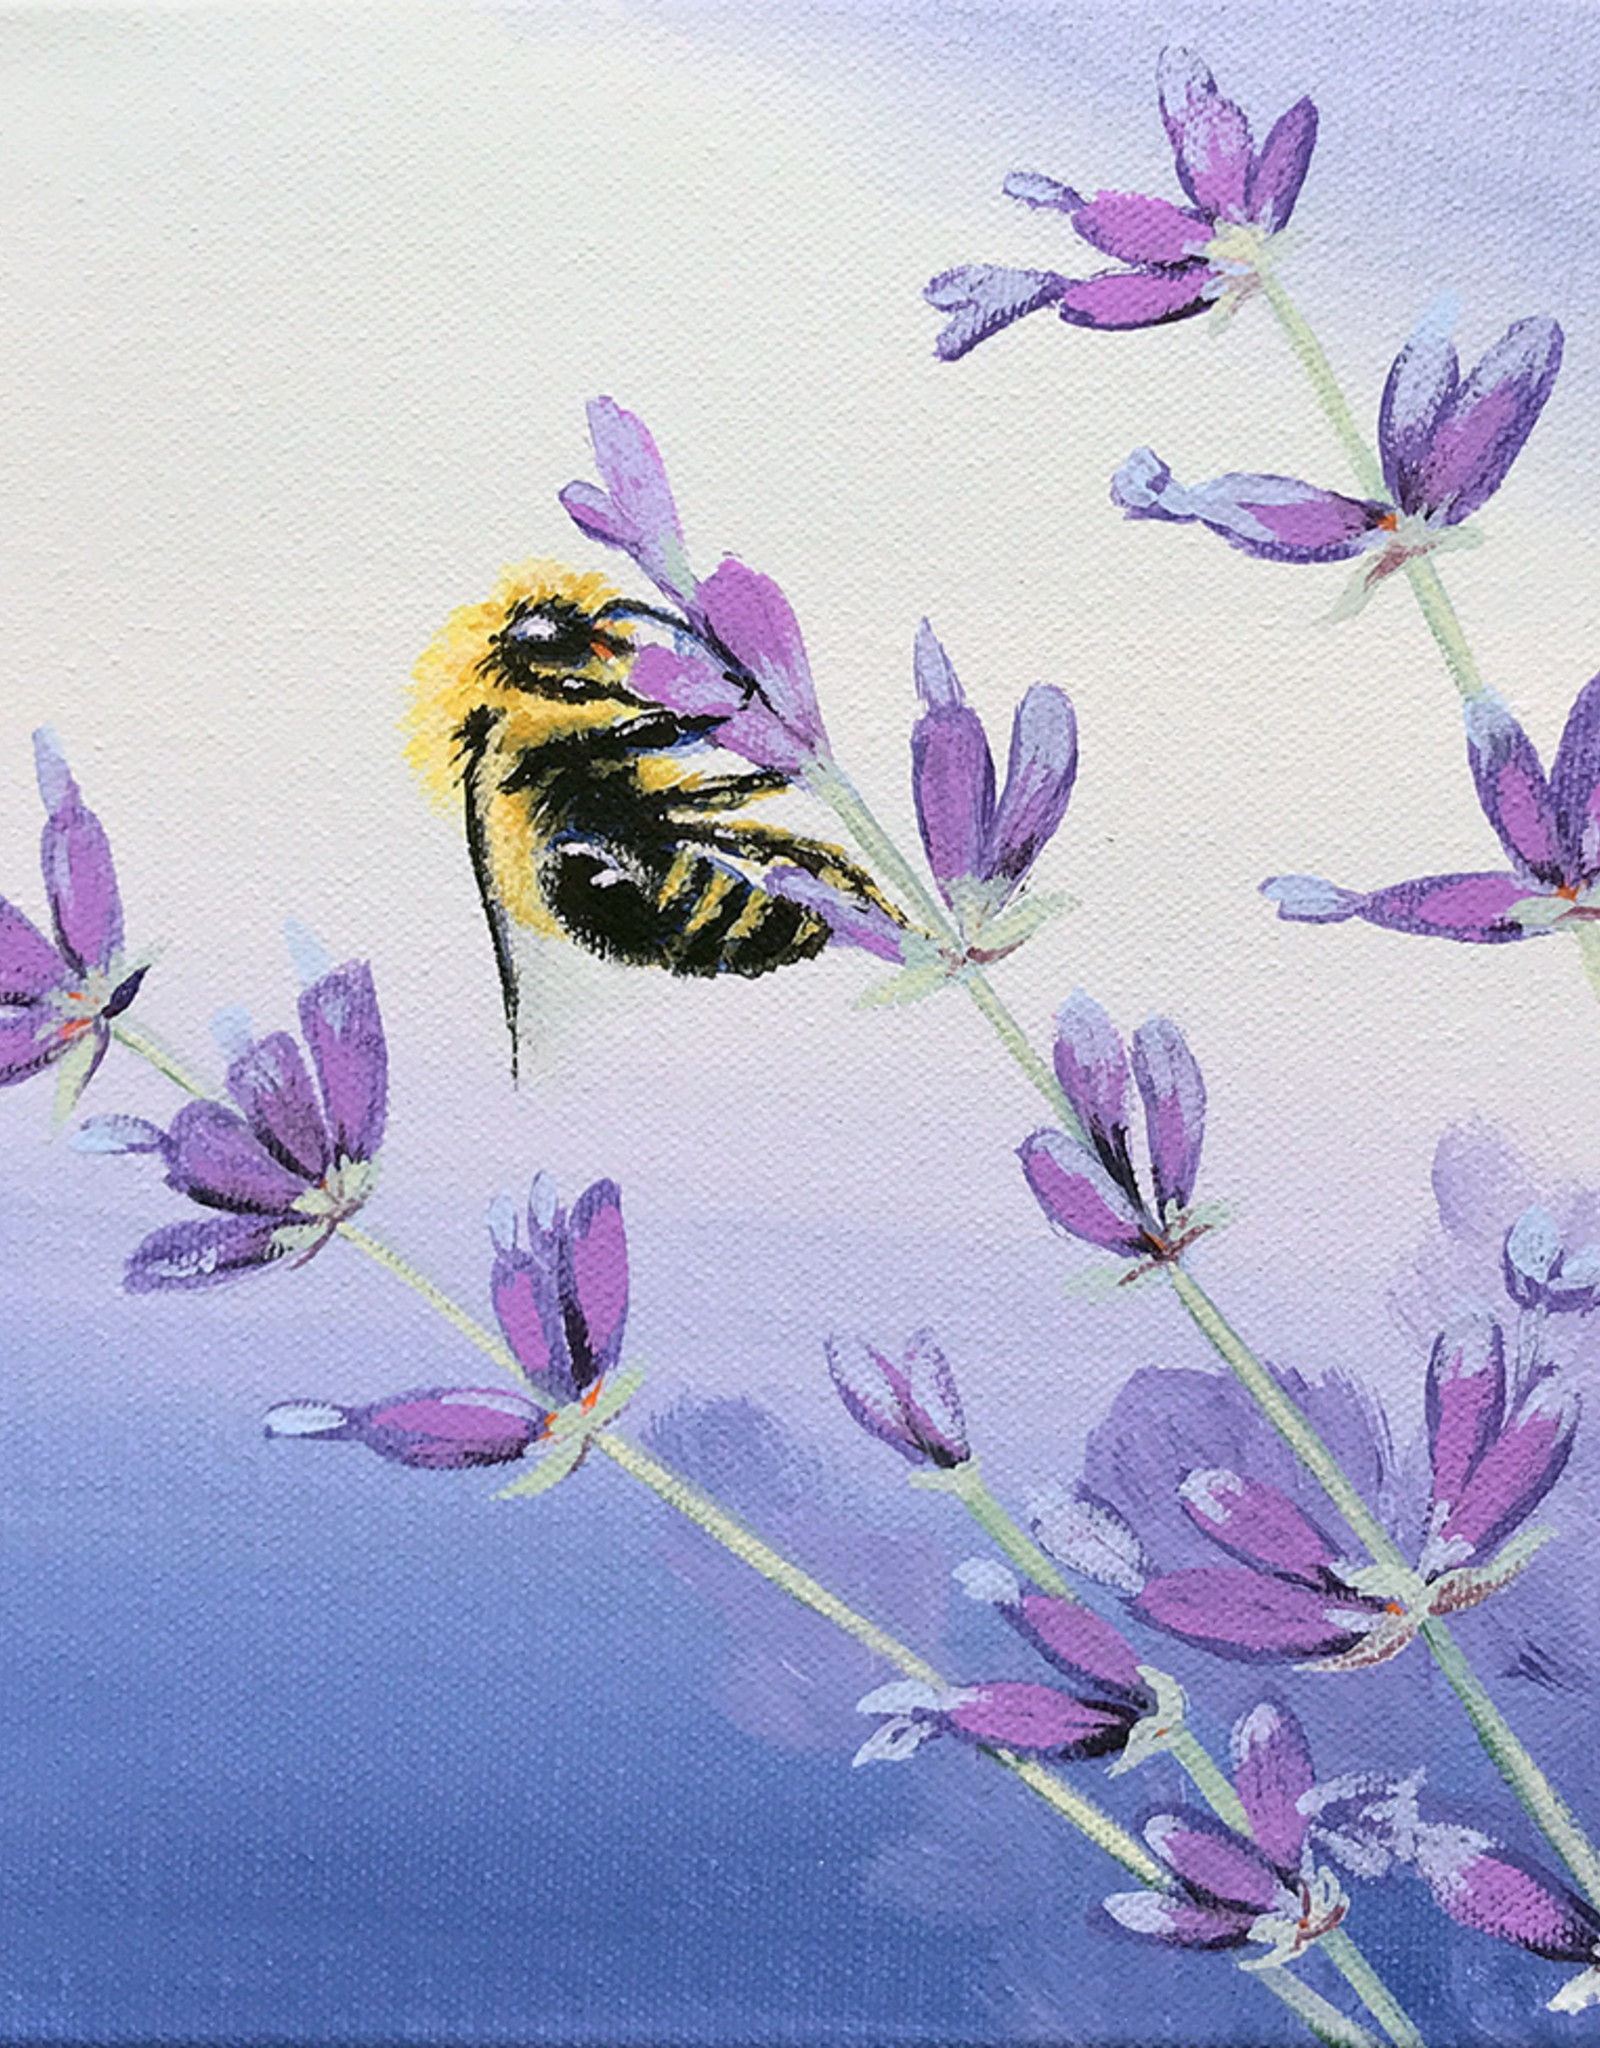 Tamara S Art Class: Acrylic Bee and Lavender Tues Aug 11